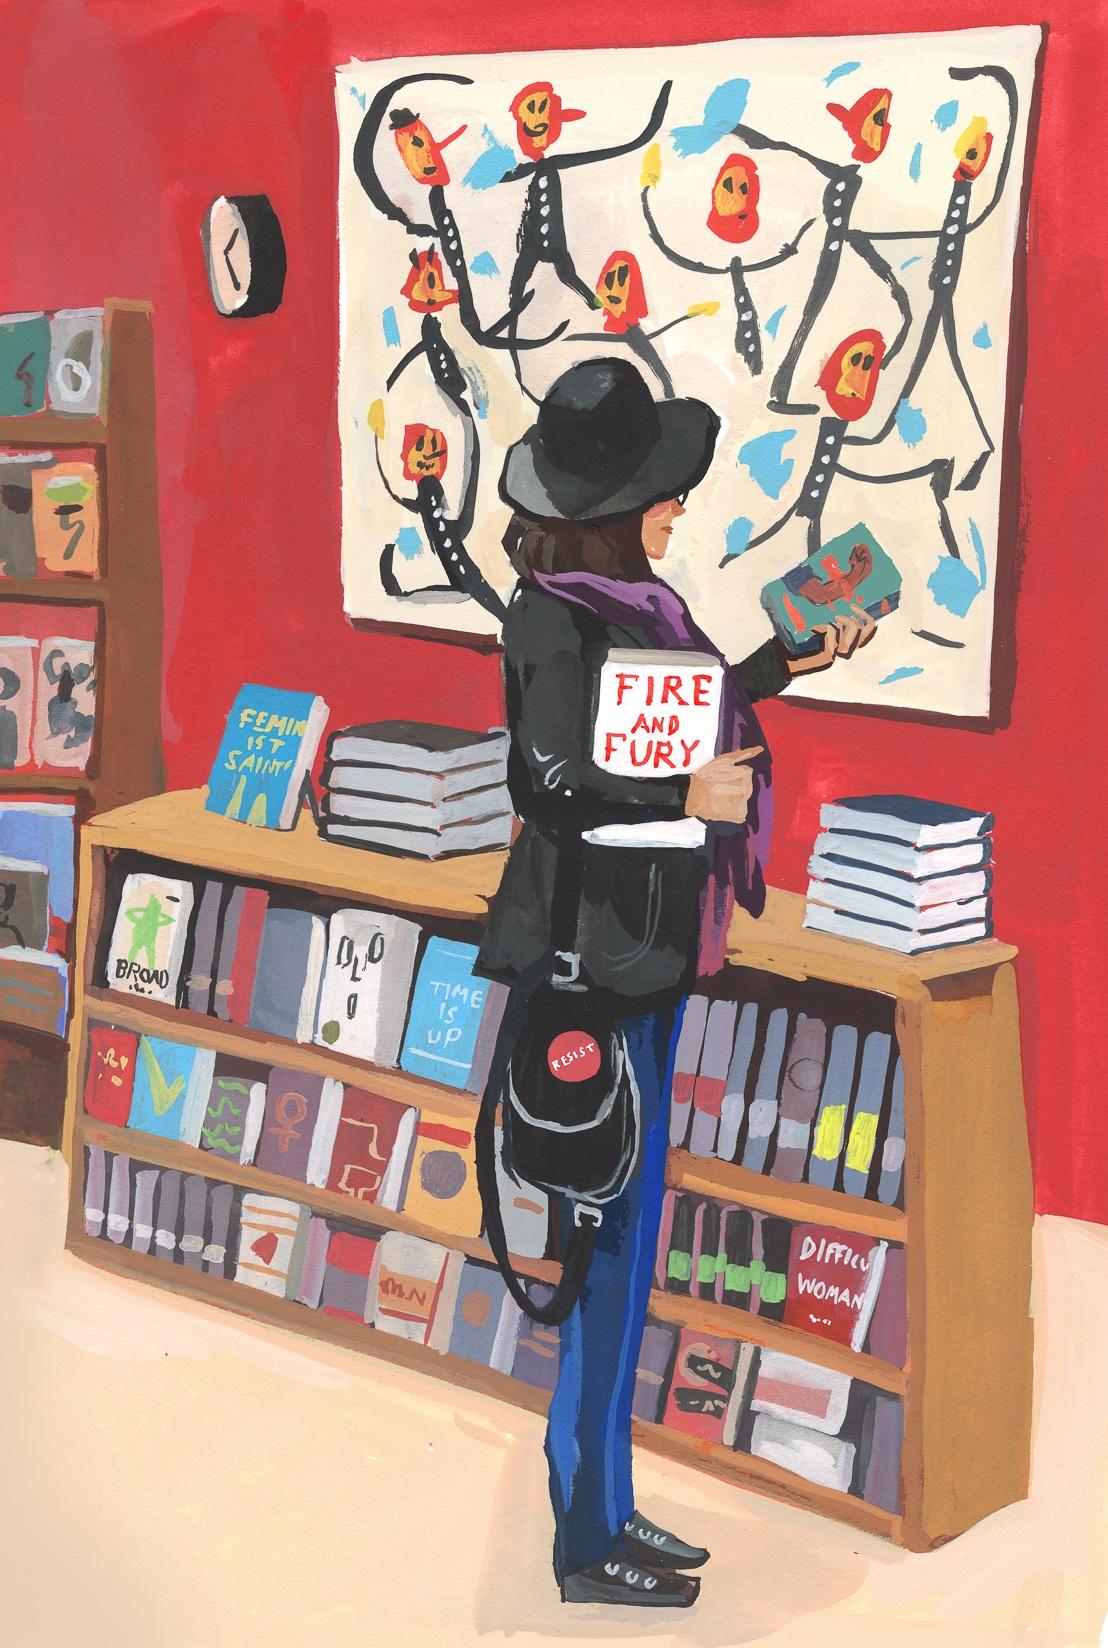 CA 60 2019, SOI 61 2018 - ARTIST: Jenny KroikTITLE: Feminist [Series, 3 of 7]